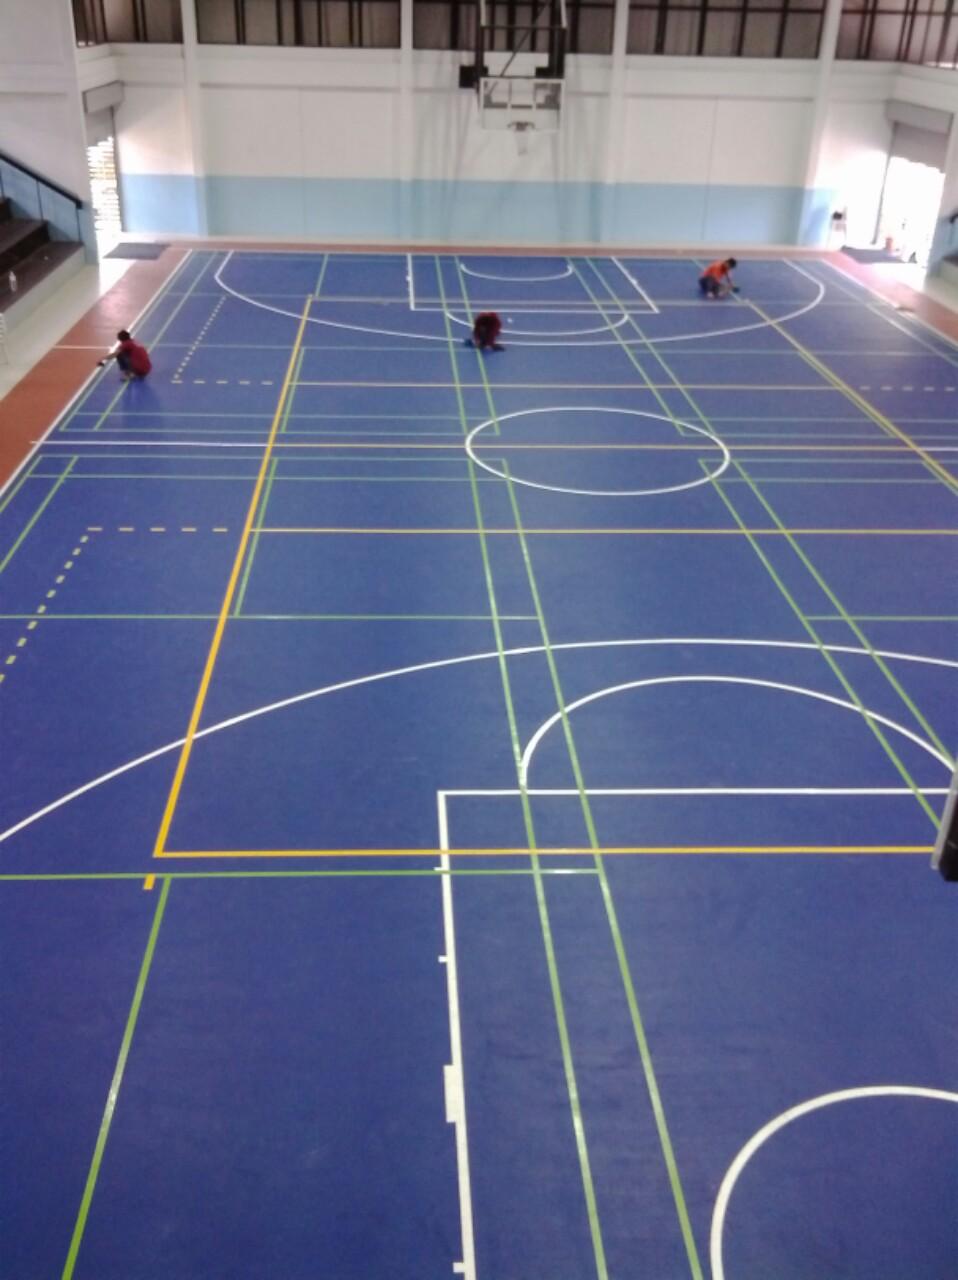 Pu/Acrylic Outdoor Basketball Sport Flooring System Field